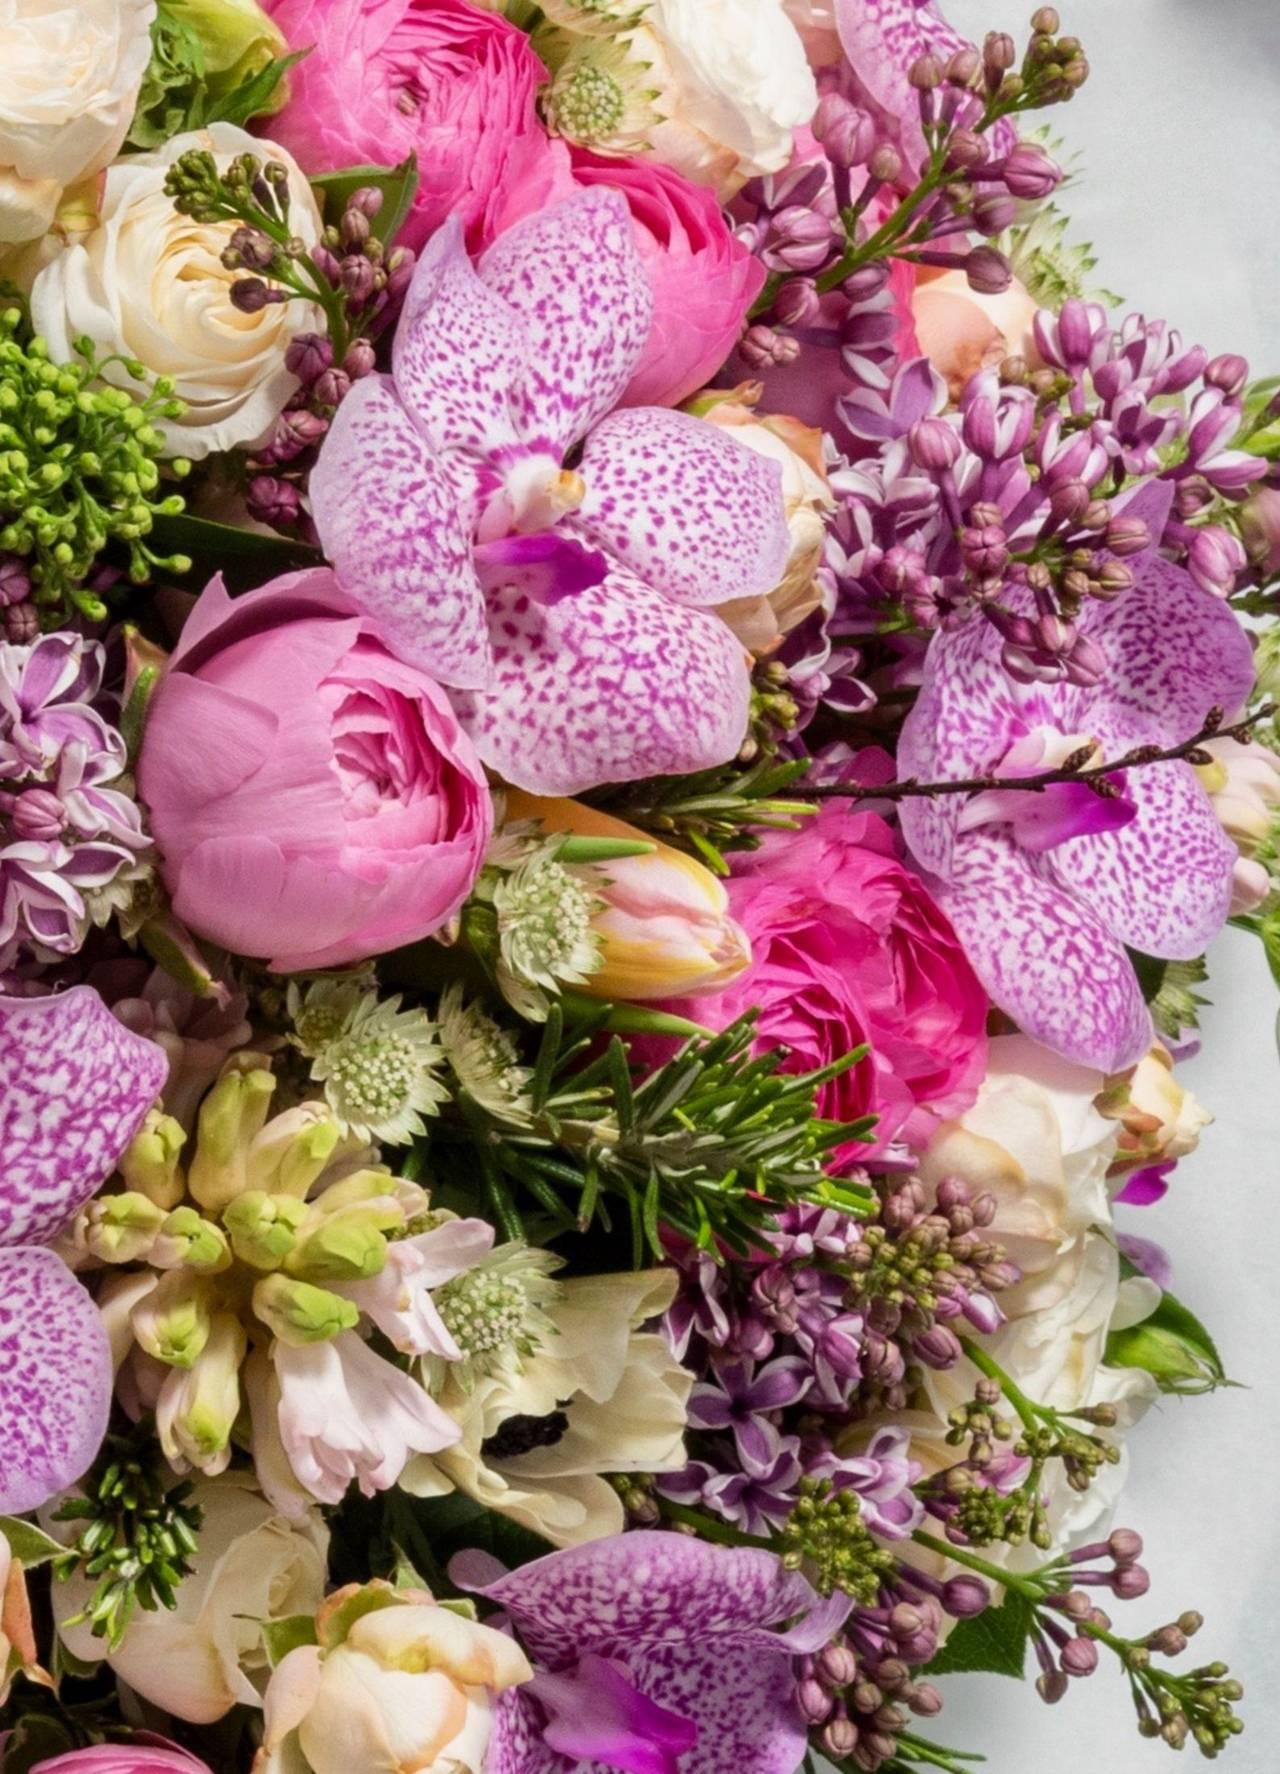 Pink and pastel floral arrangement.